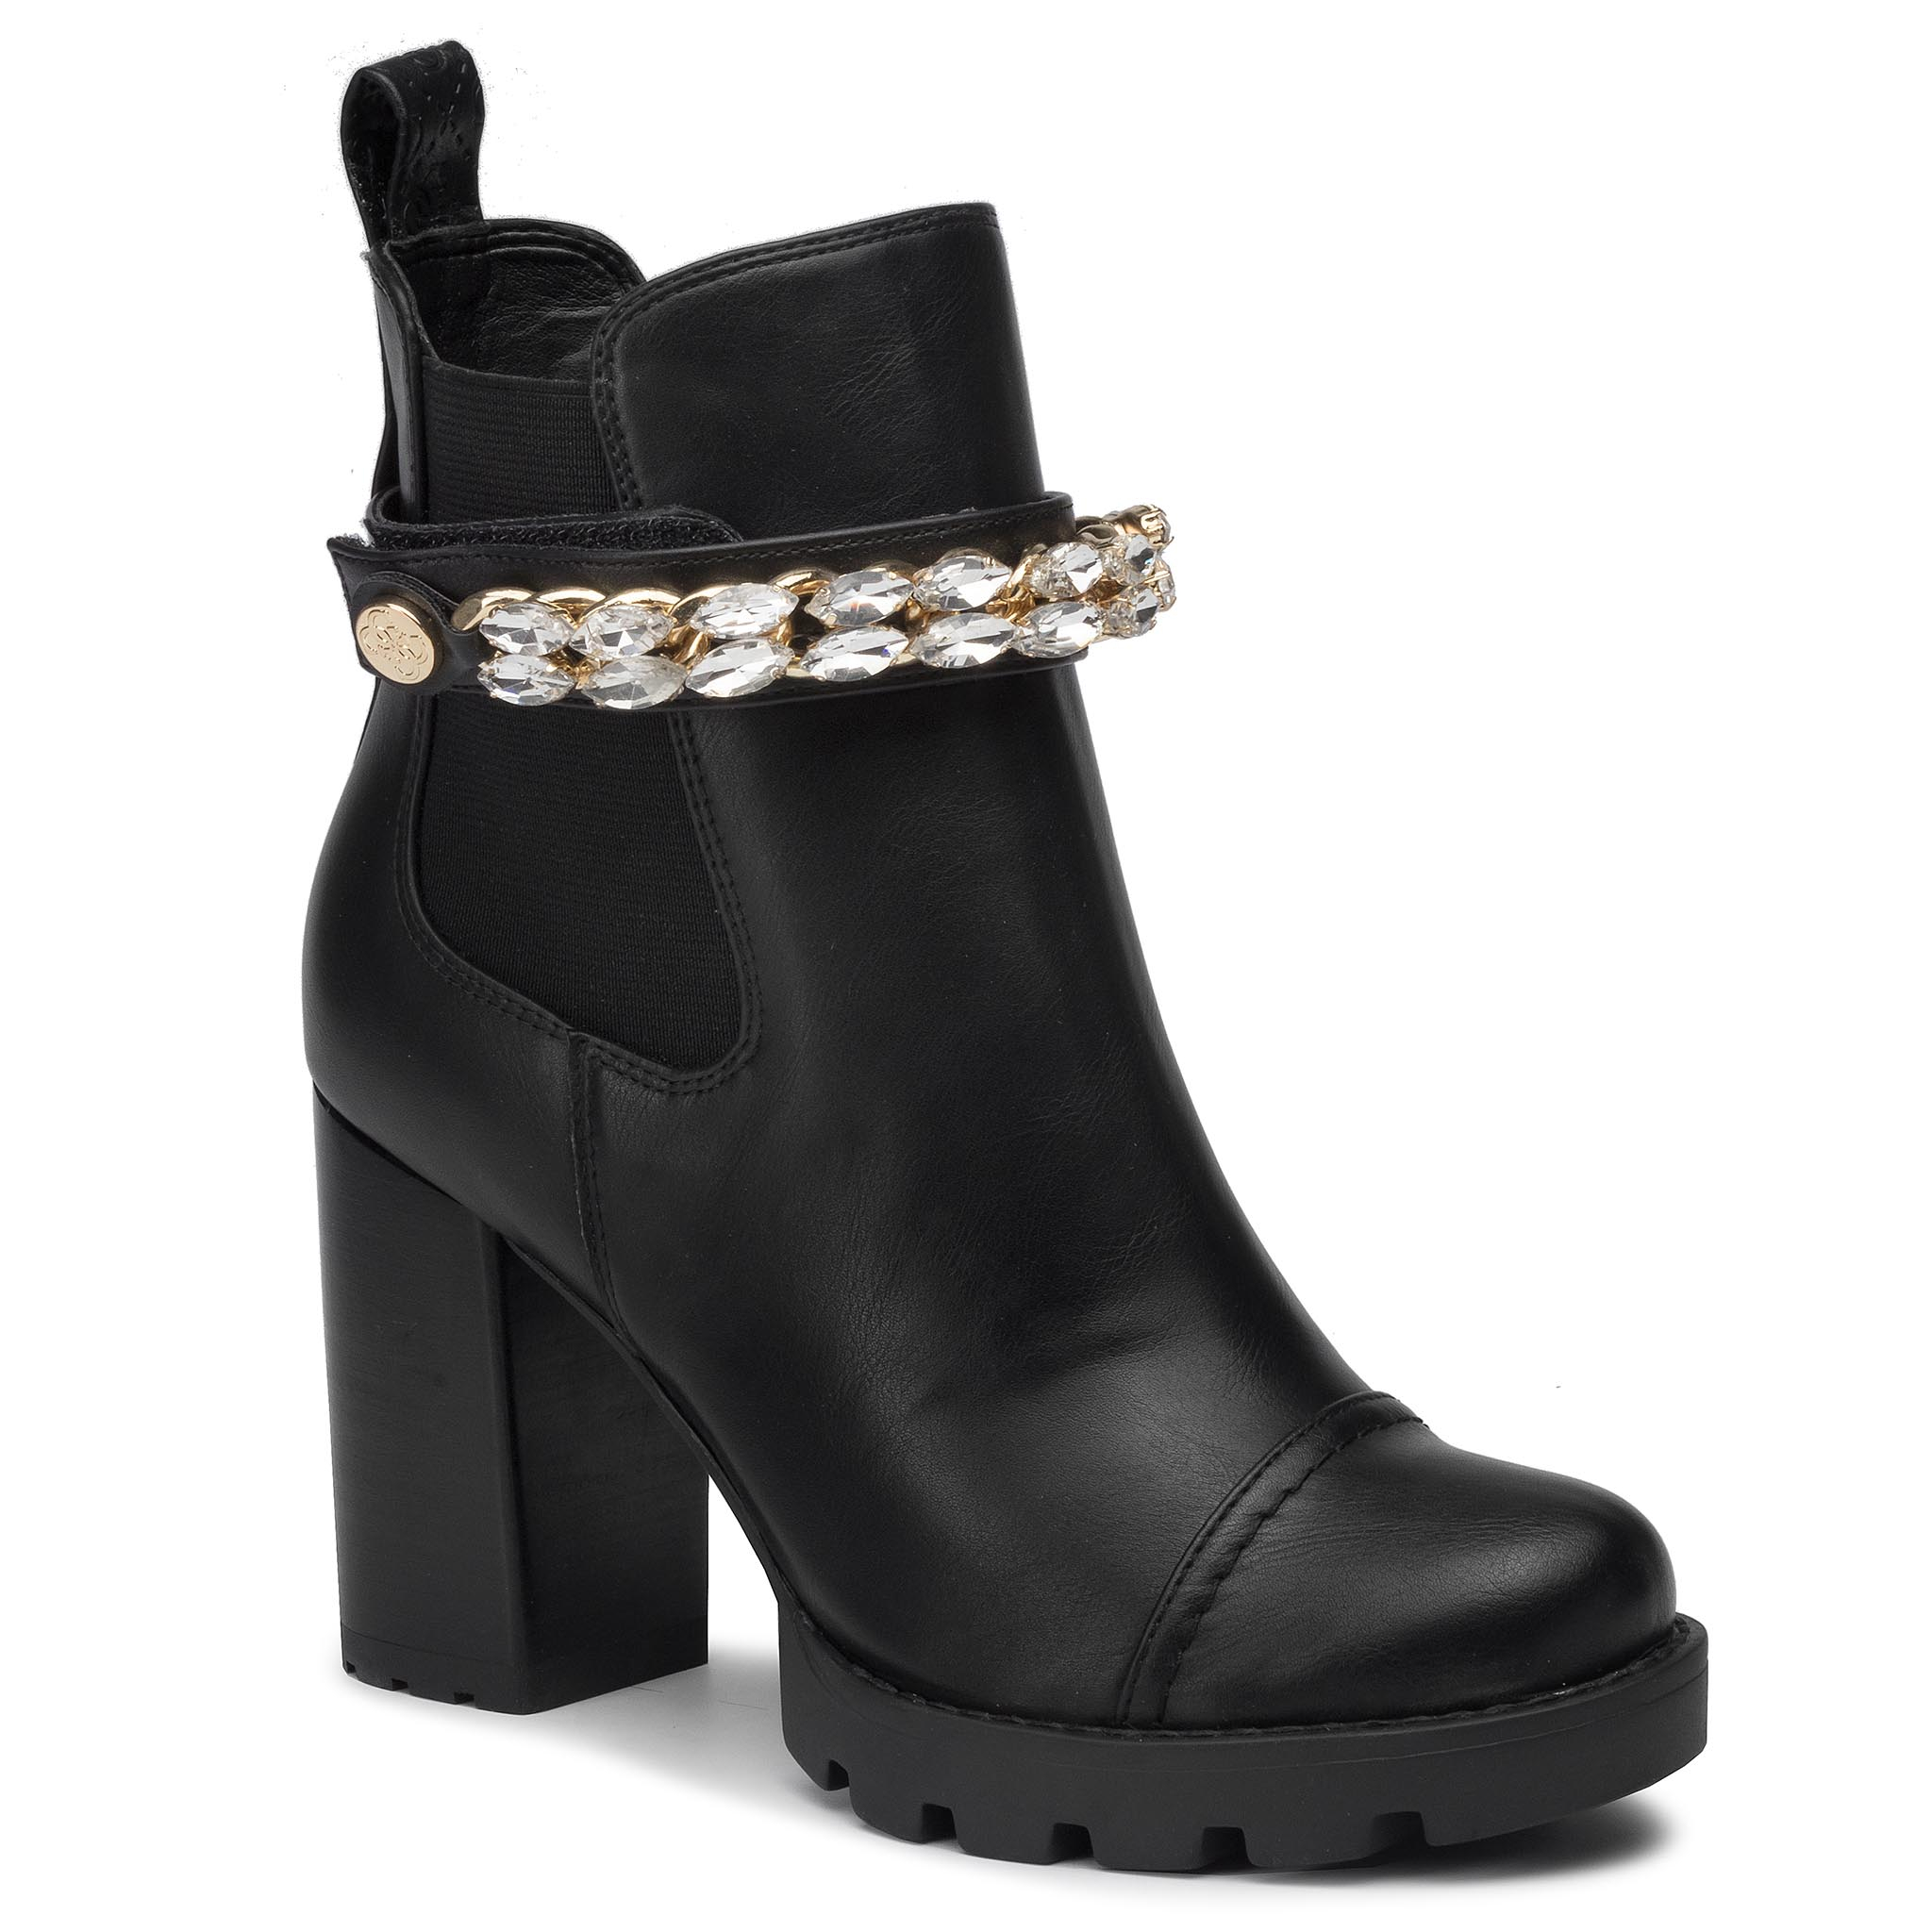 4k00:15Woman Legs Trying on High Heel Shoes In Shoe